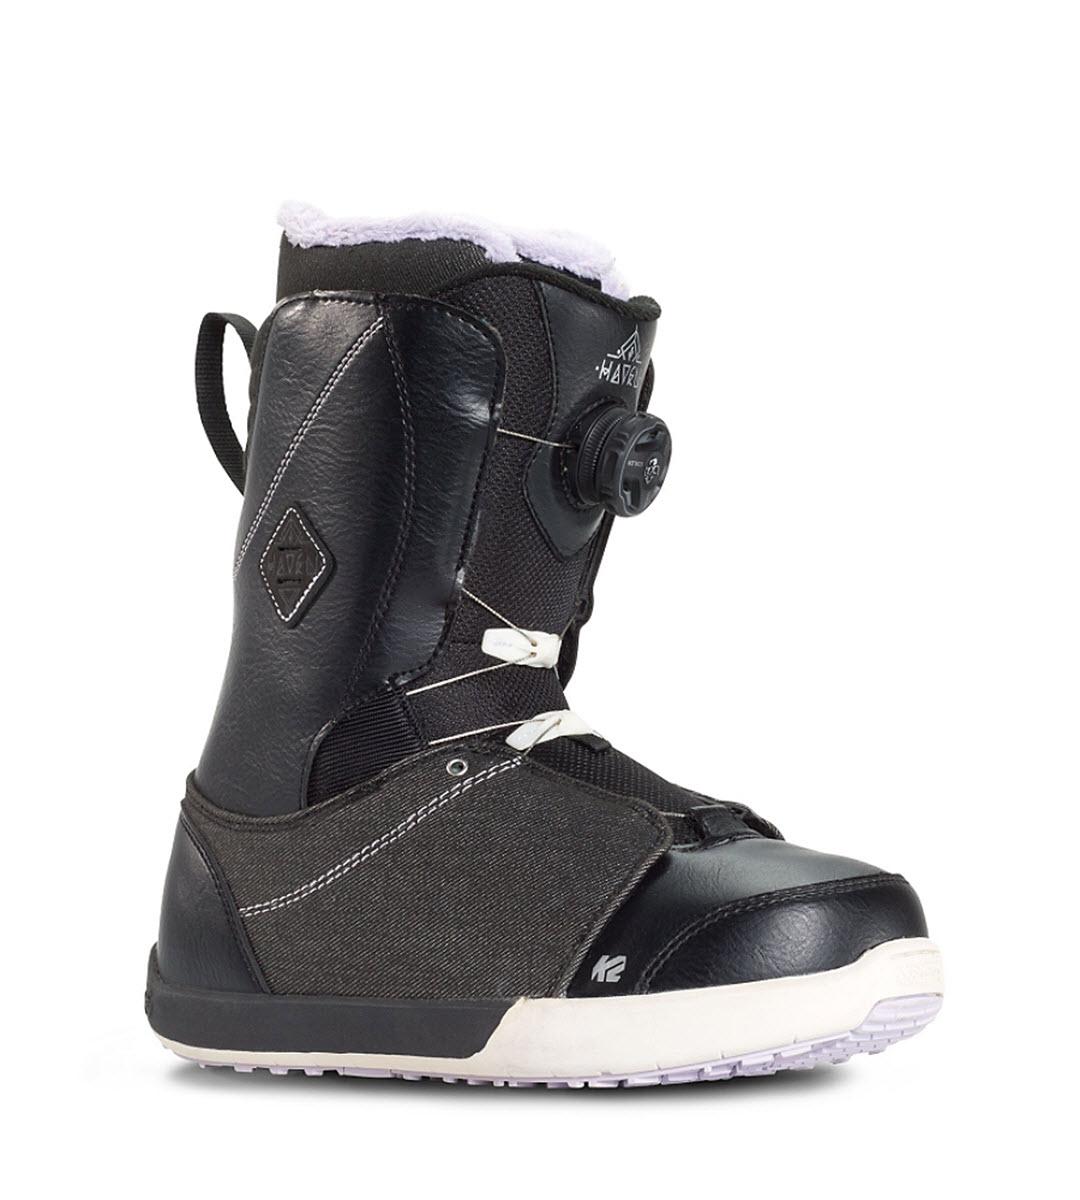 k2 womens snowboard boots 2016 black uk 8